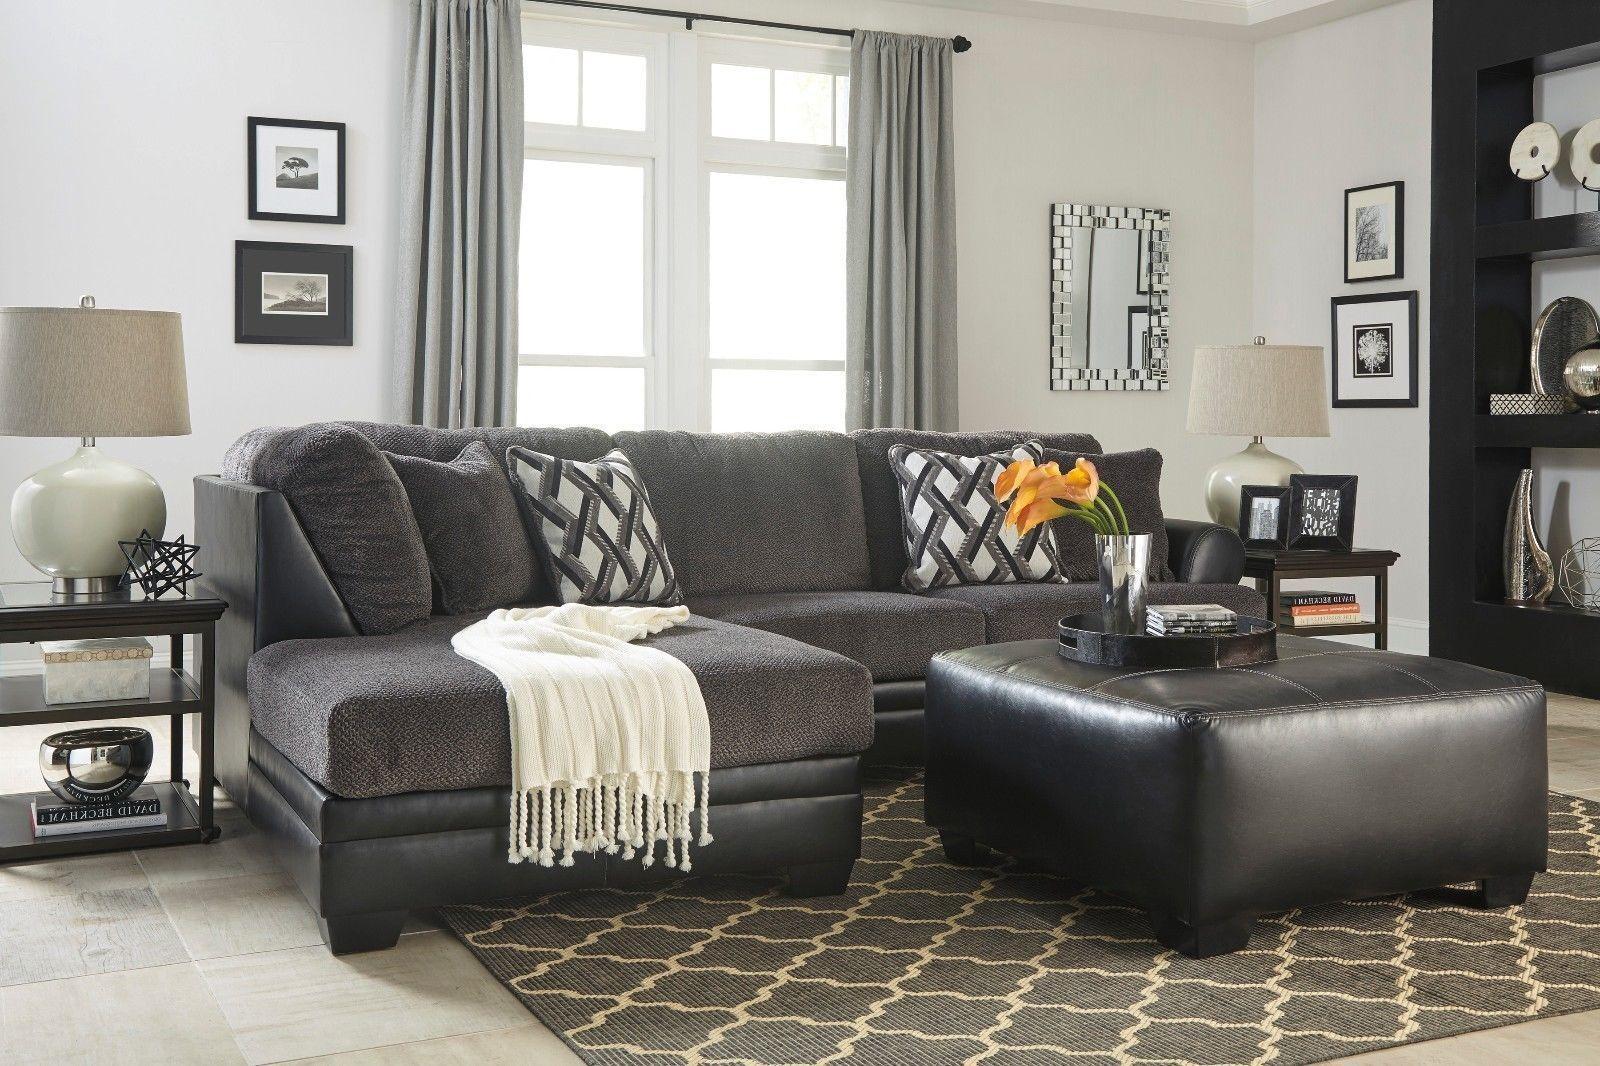 Ashley Furniture Kumasi Sofa Sectional and Chaise